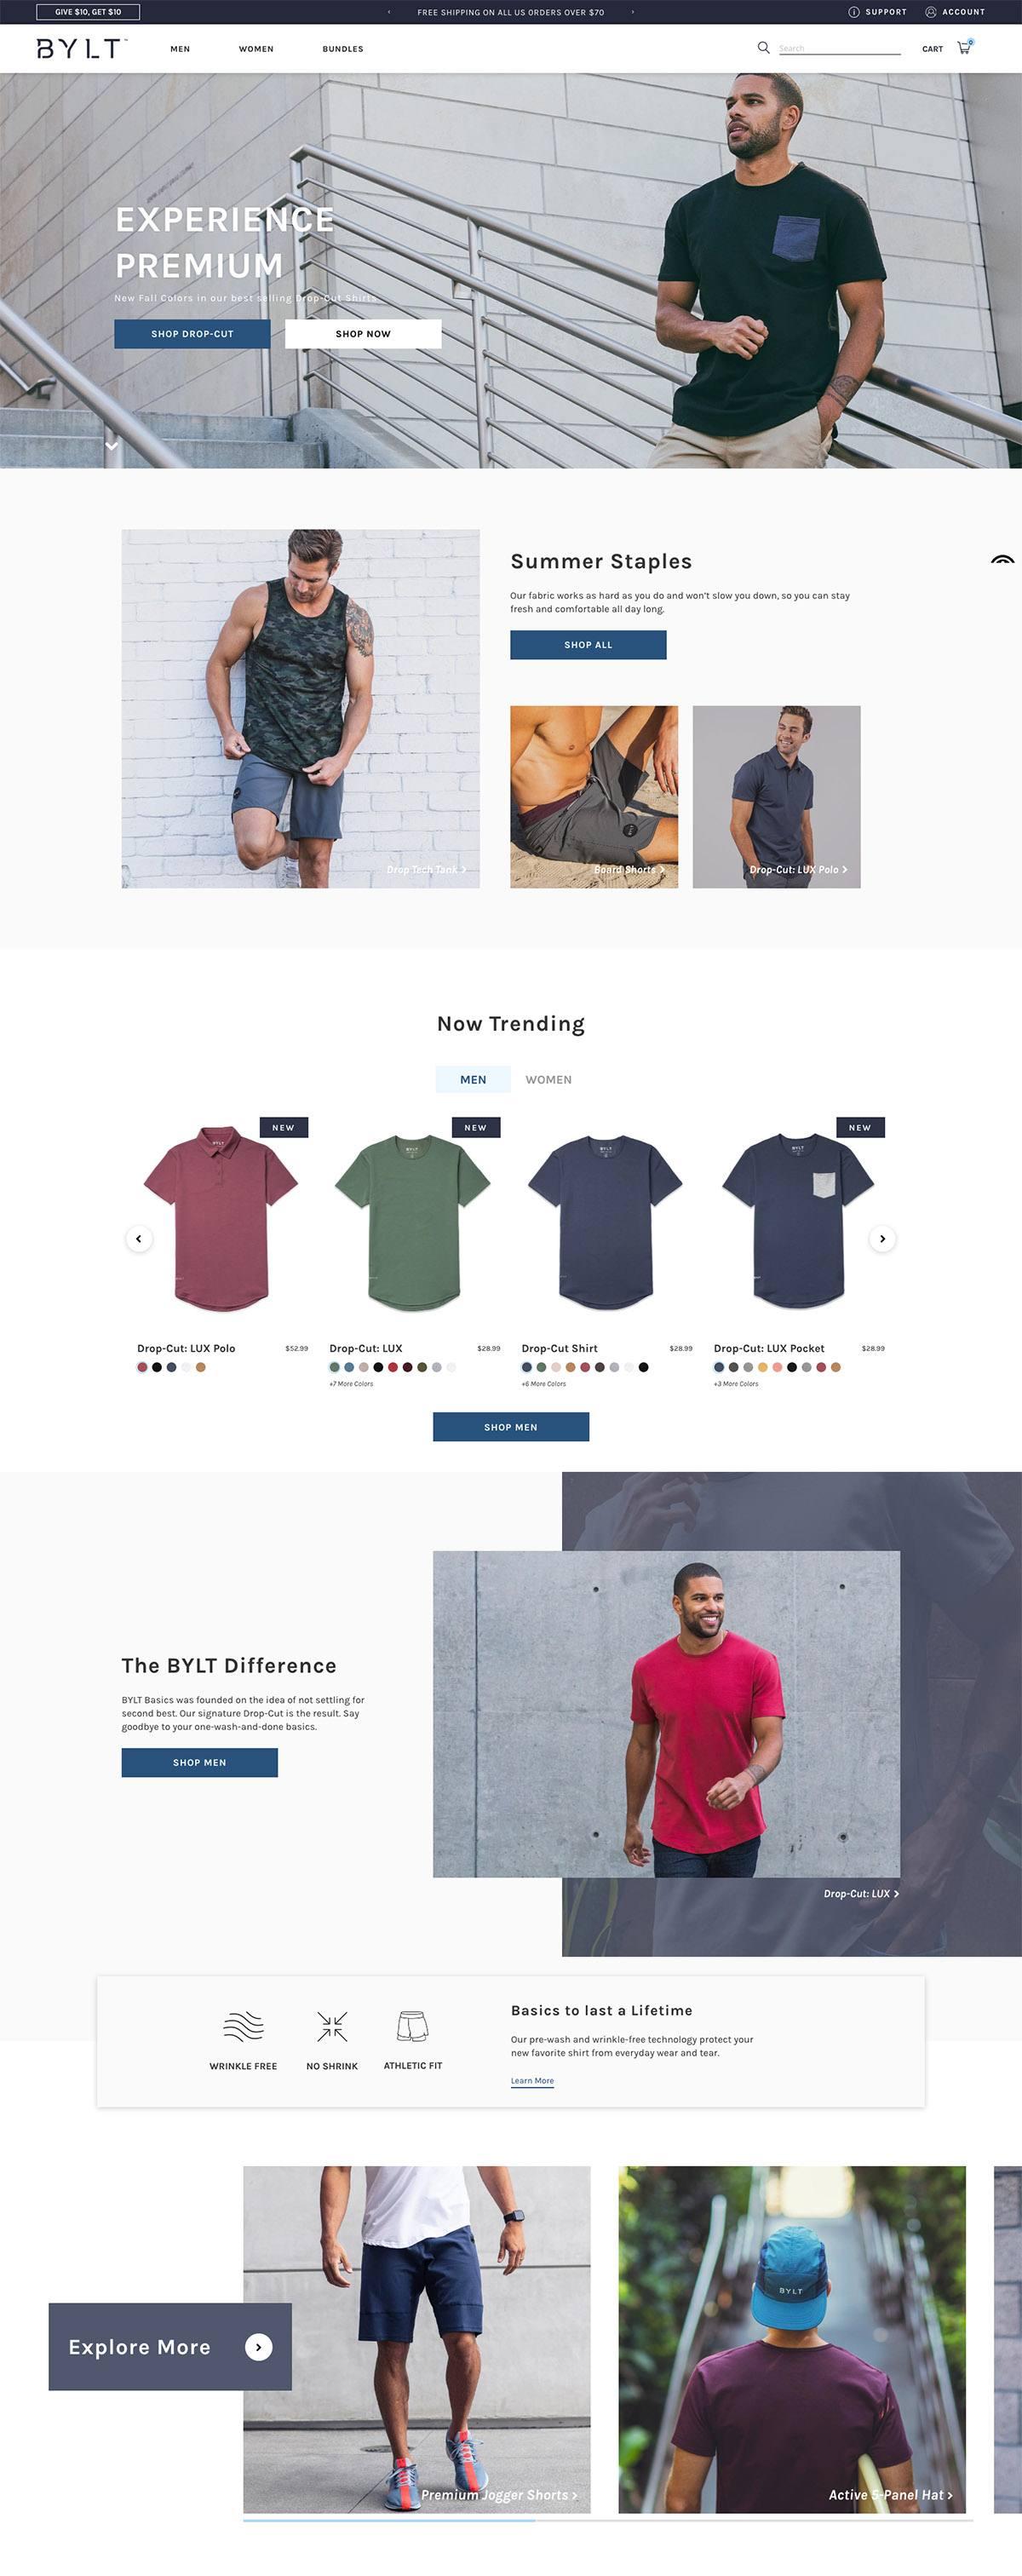 eCommerce website: BYLT Basics